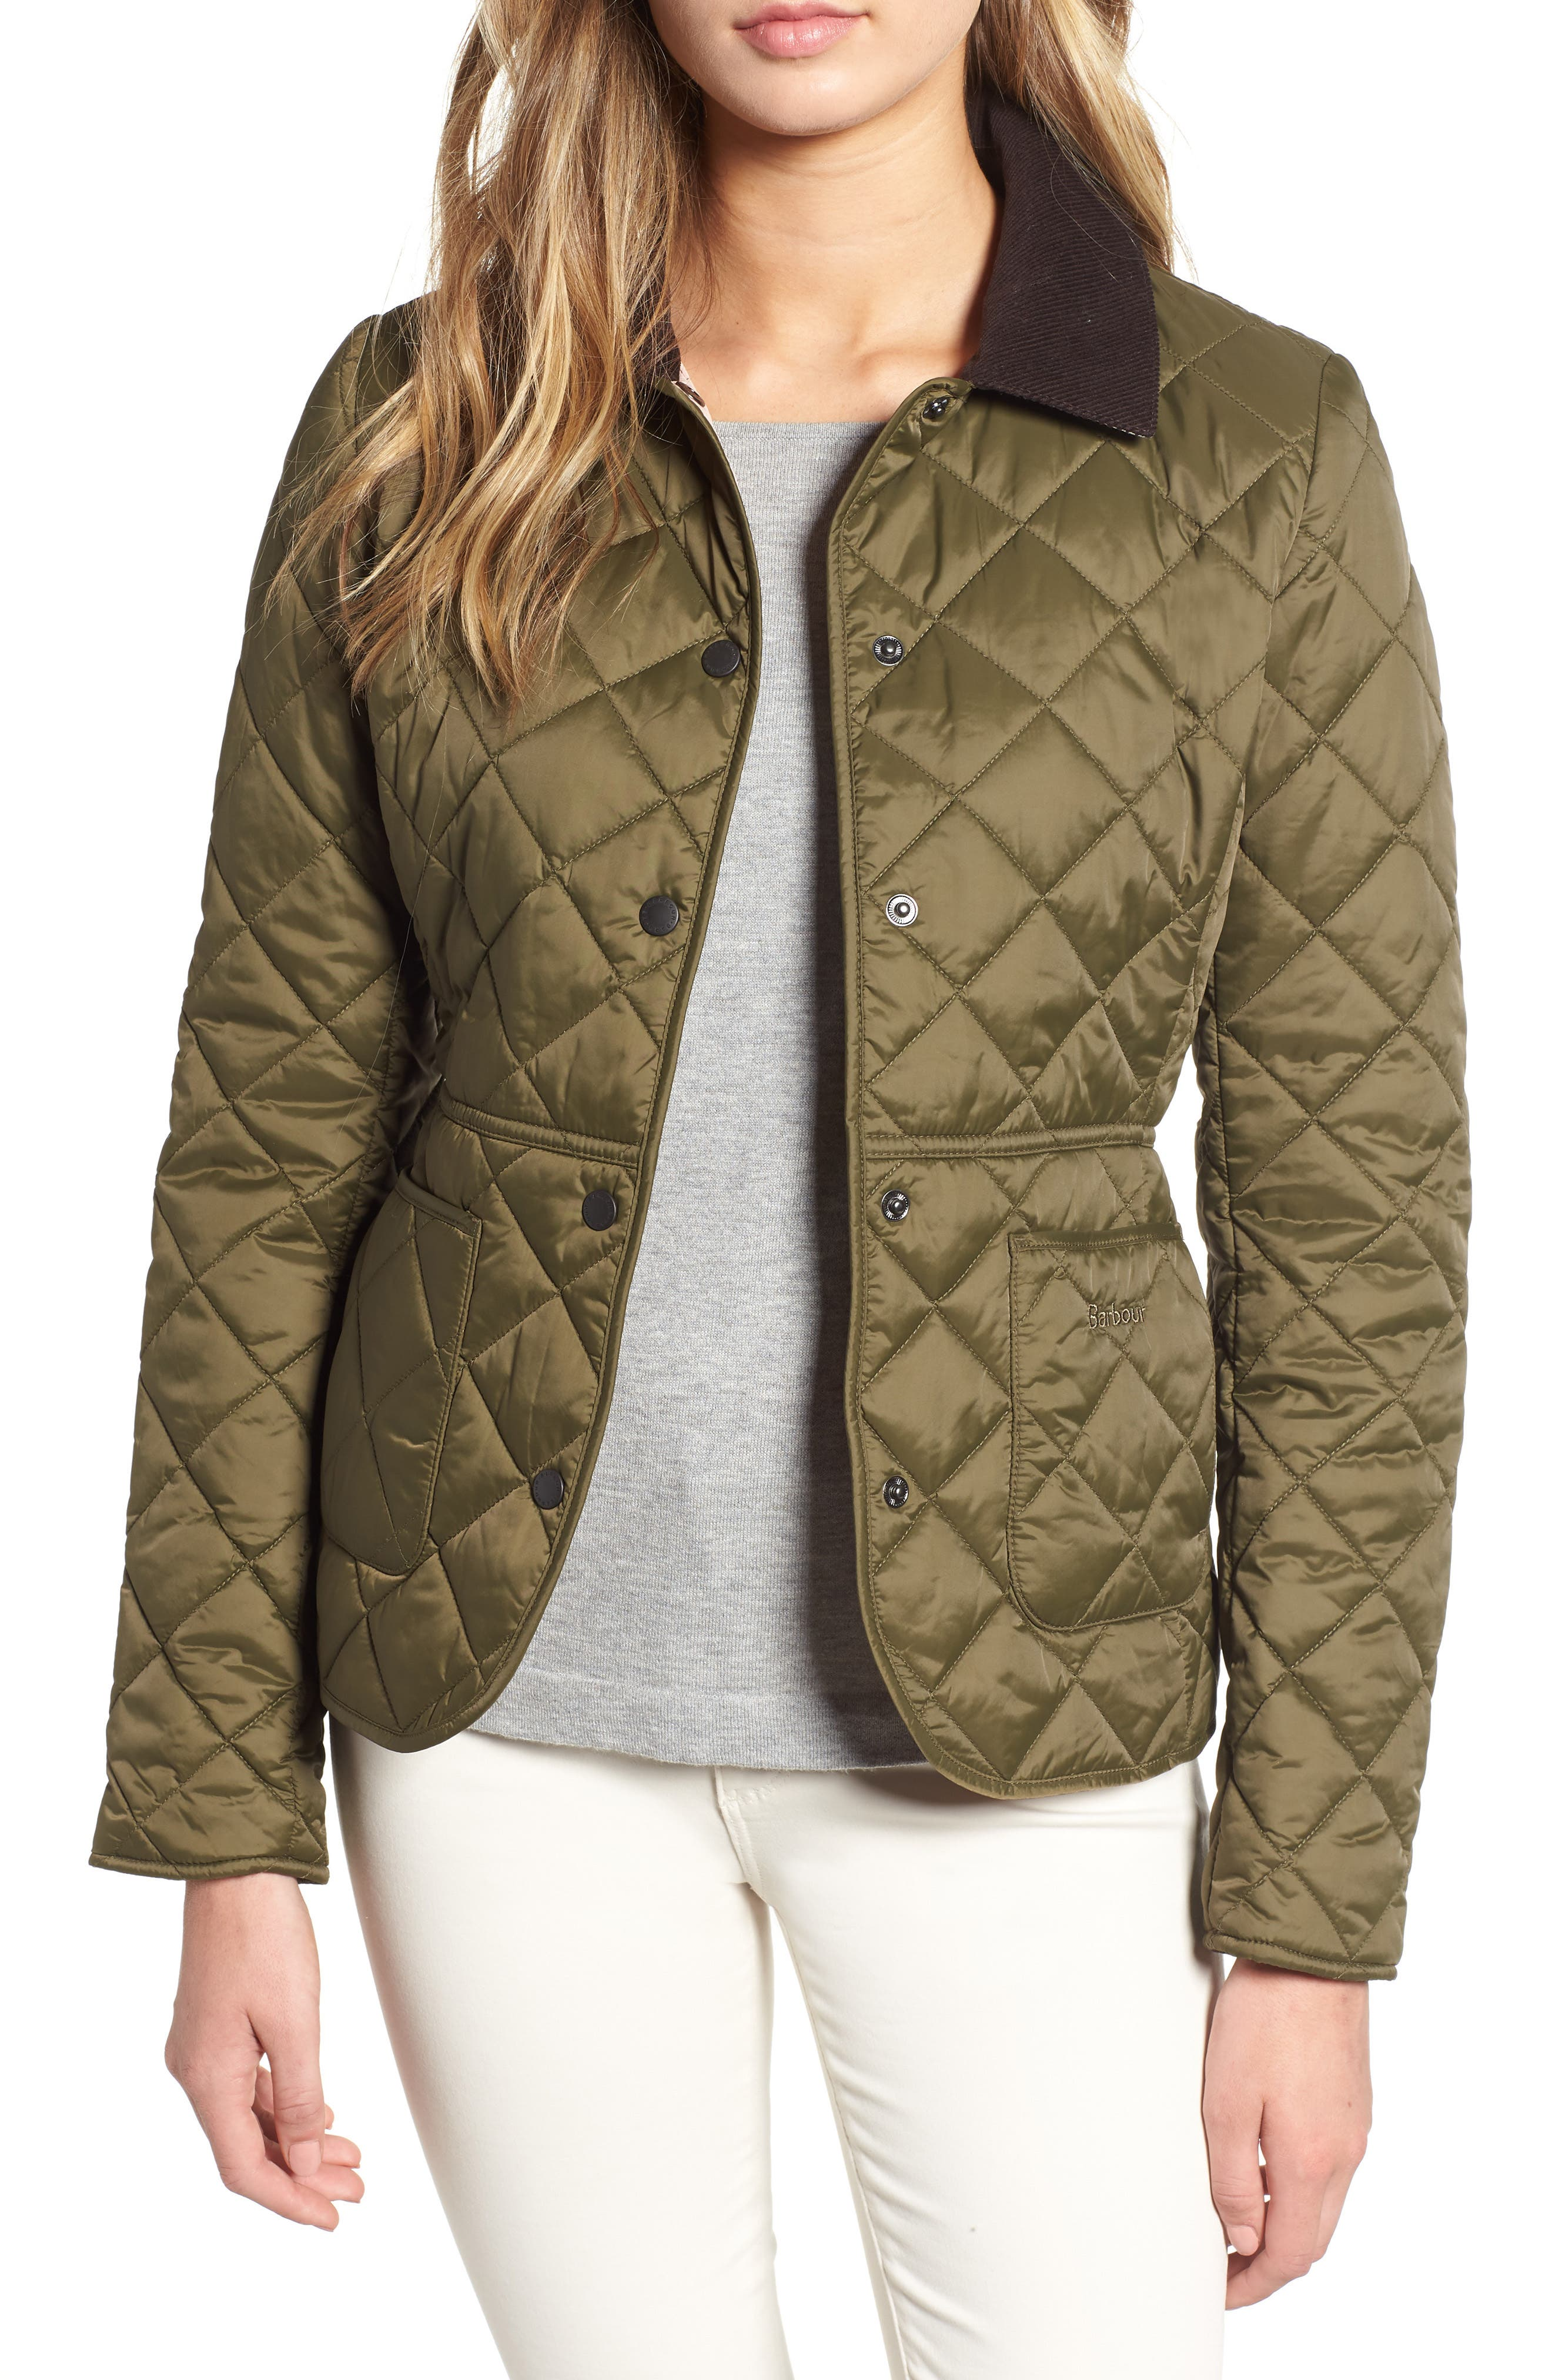 Barbour Deveron Quilted Jacket, 18 UK - Green